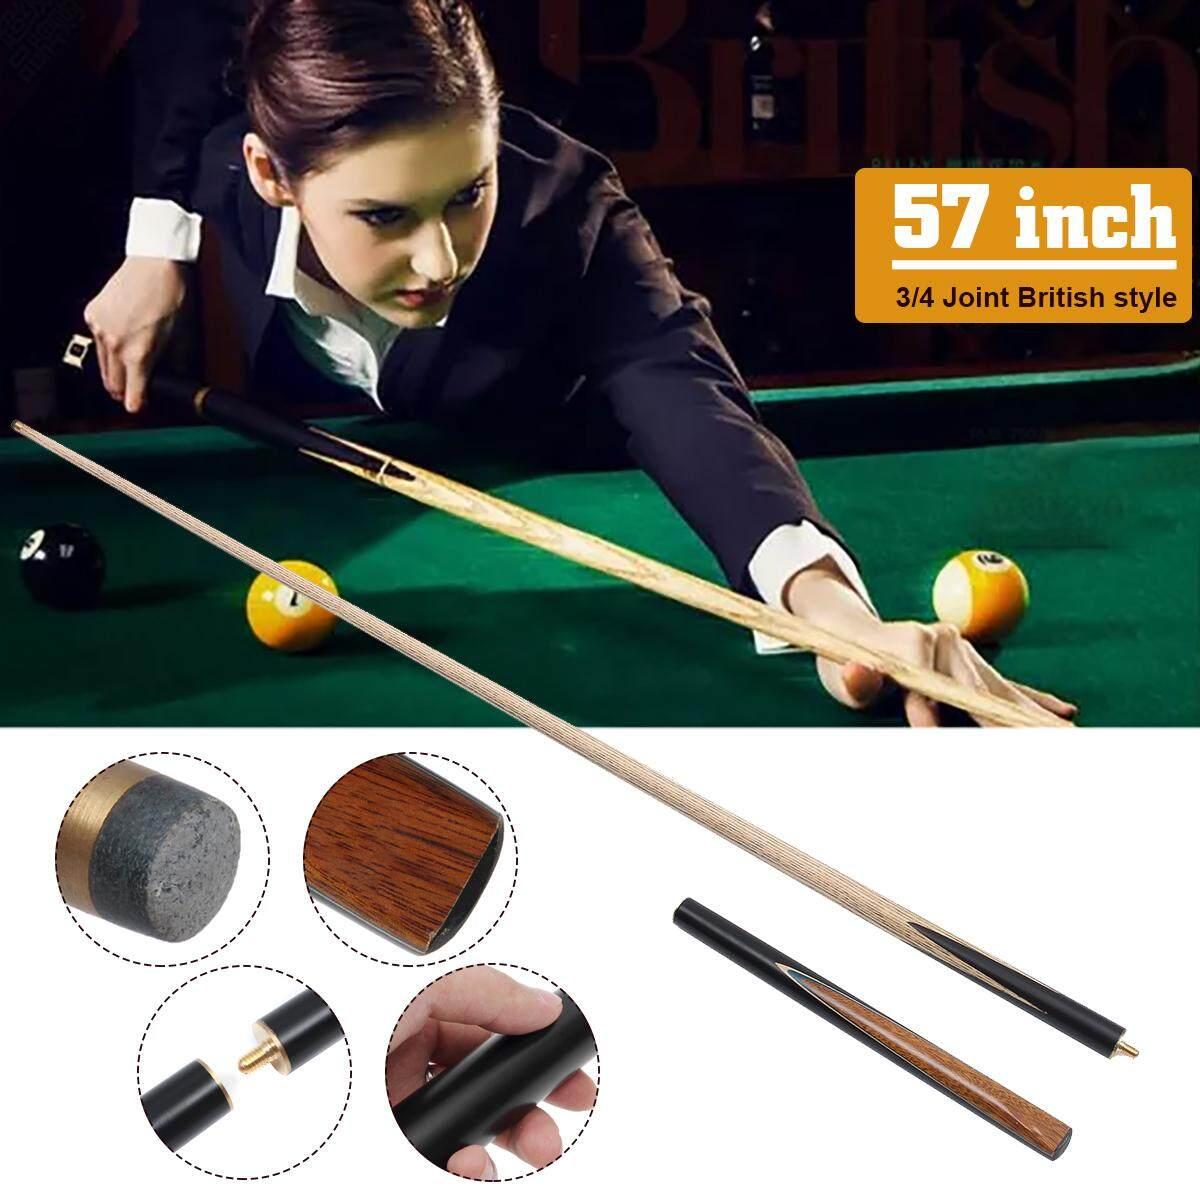 145cm 9.5mm small head 3/4 section billiard bar British snooker cue ash forefoot blackwood post